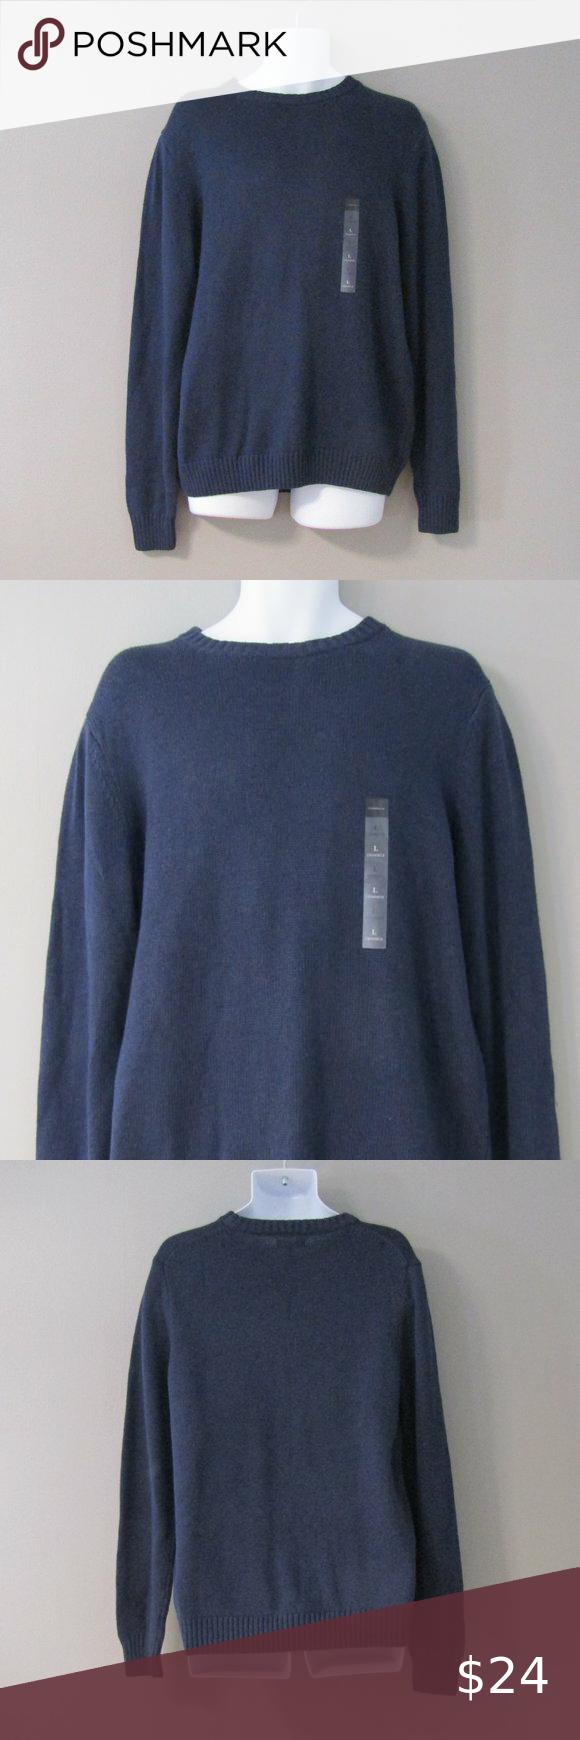 Nwt Croft Barrow Crew Neck Navy Blue Sweater L Navy Blue Sweater Blue Sweaters Sweaters [ 1740 x 580 Pixel ]